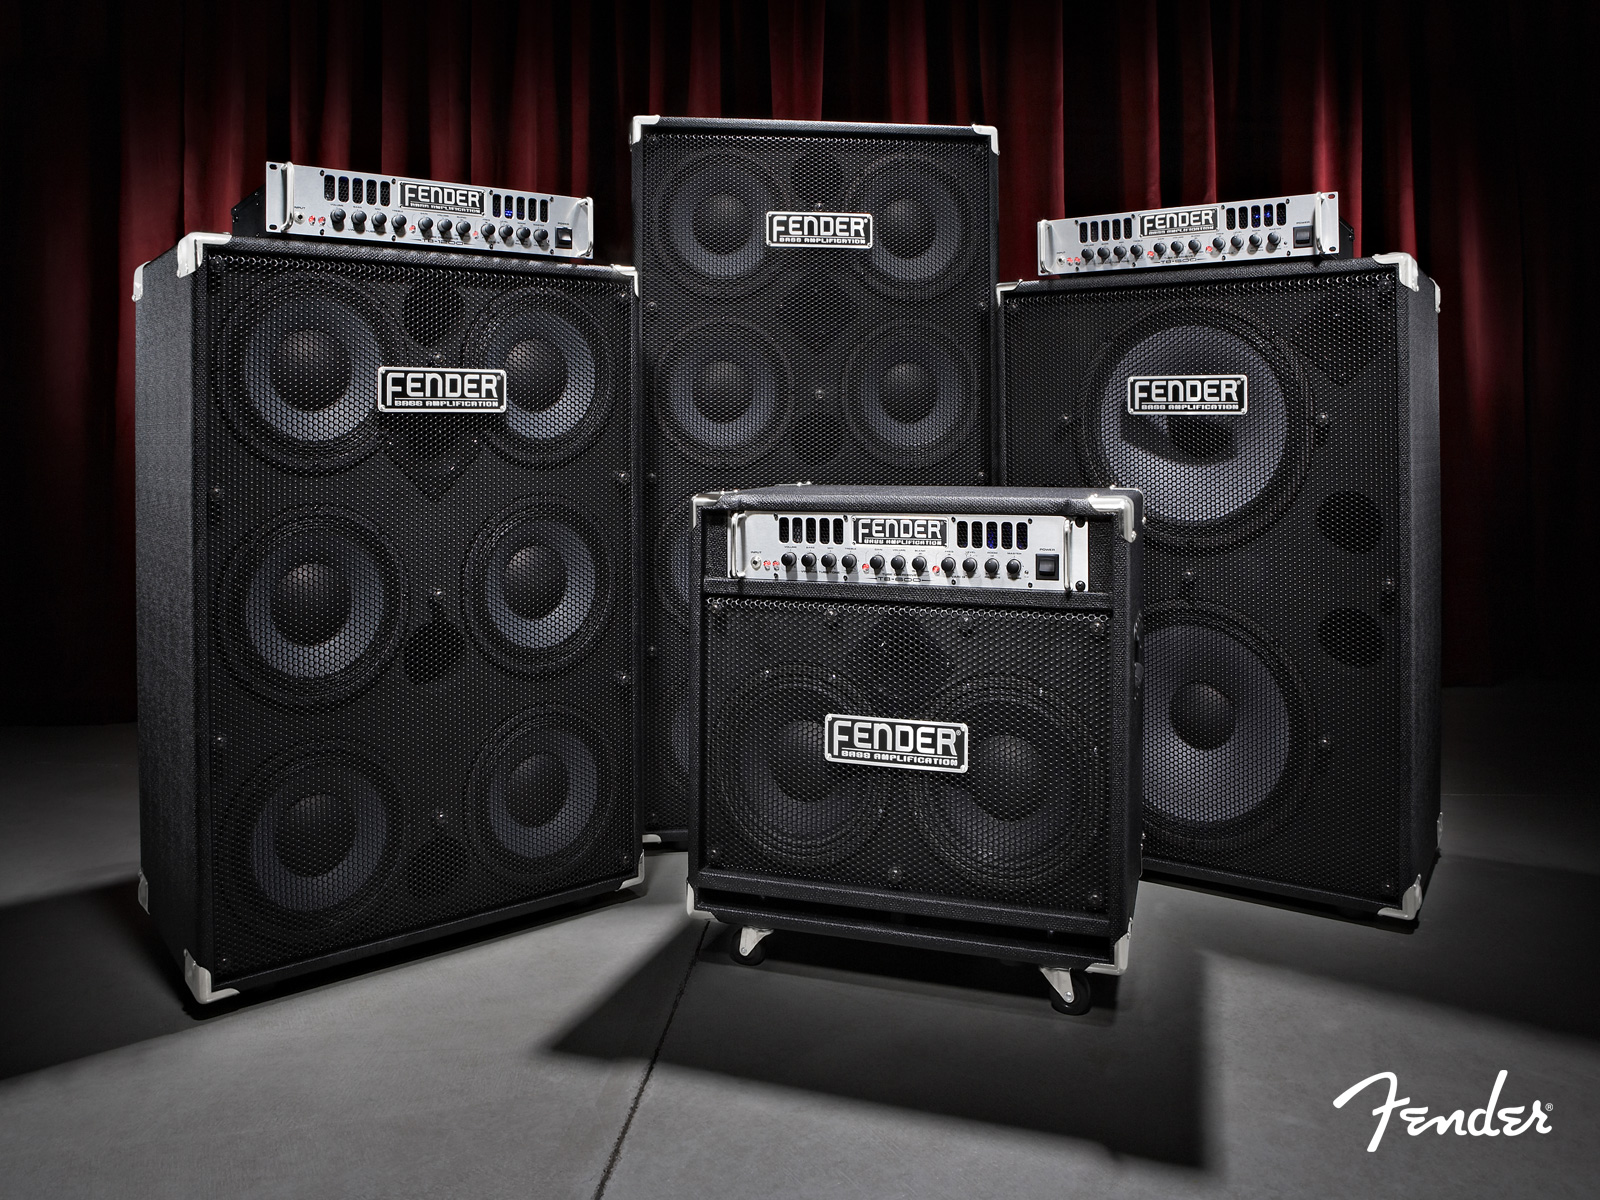 Fender Bass Amp Wallpaper By Cmdry72 On Deviantart